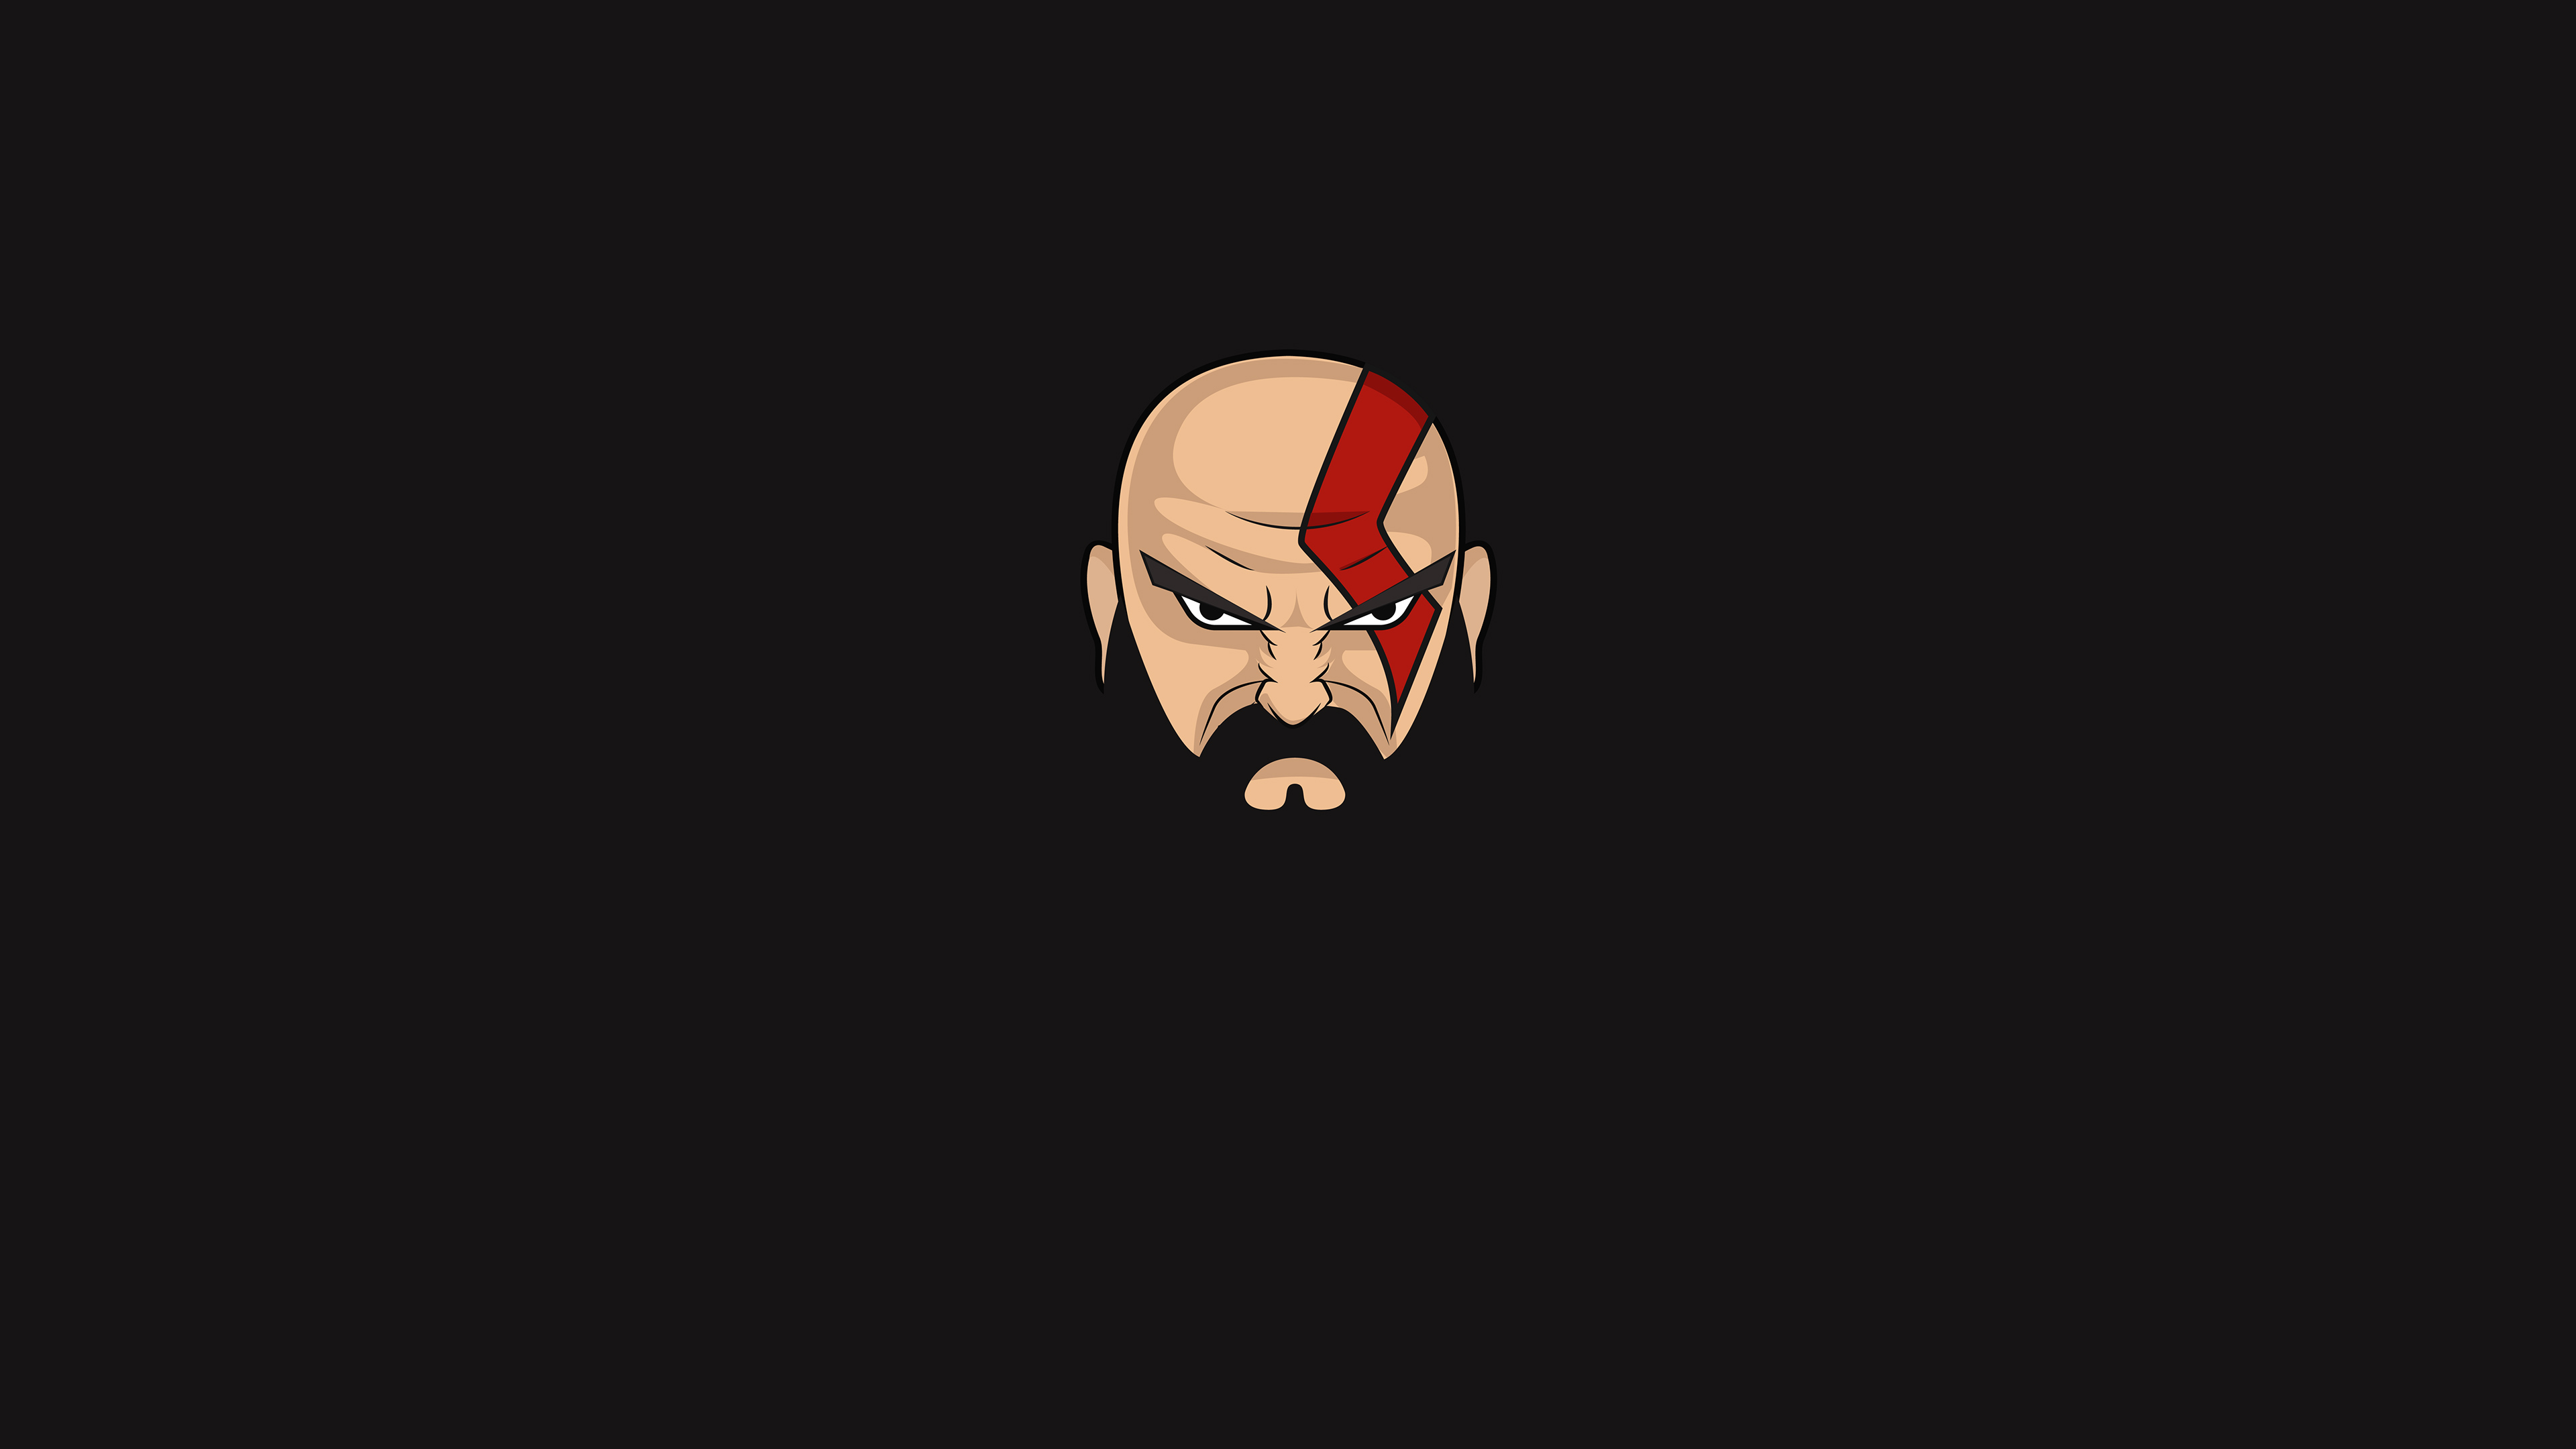 2048x1152 Minimal Kratos 2048x1152 Resolution Hd 4k